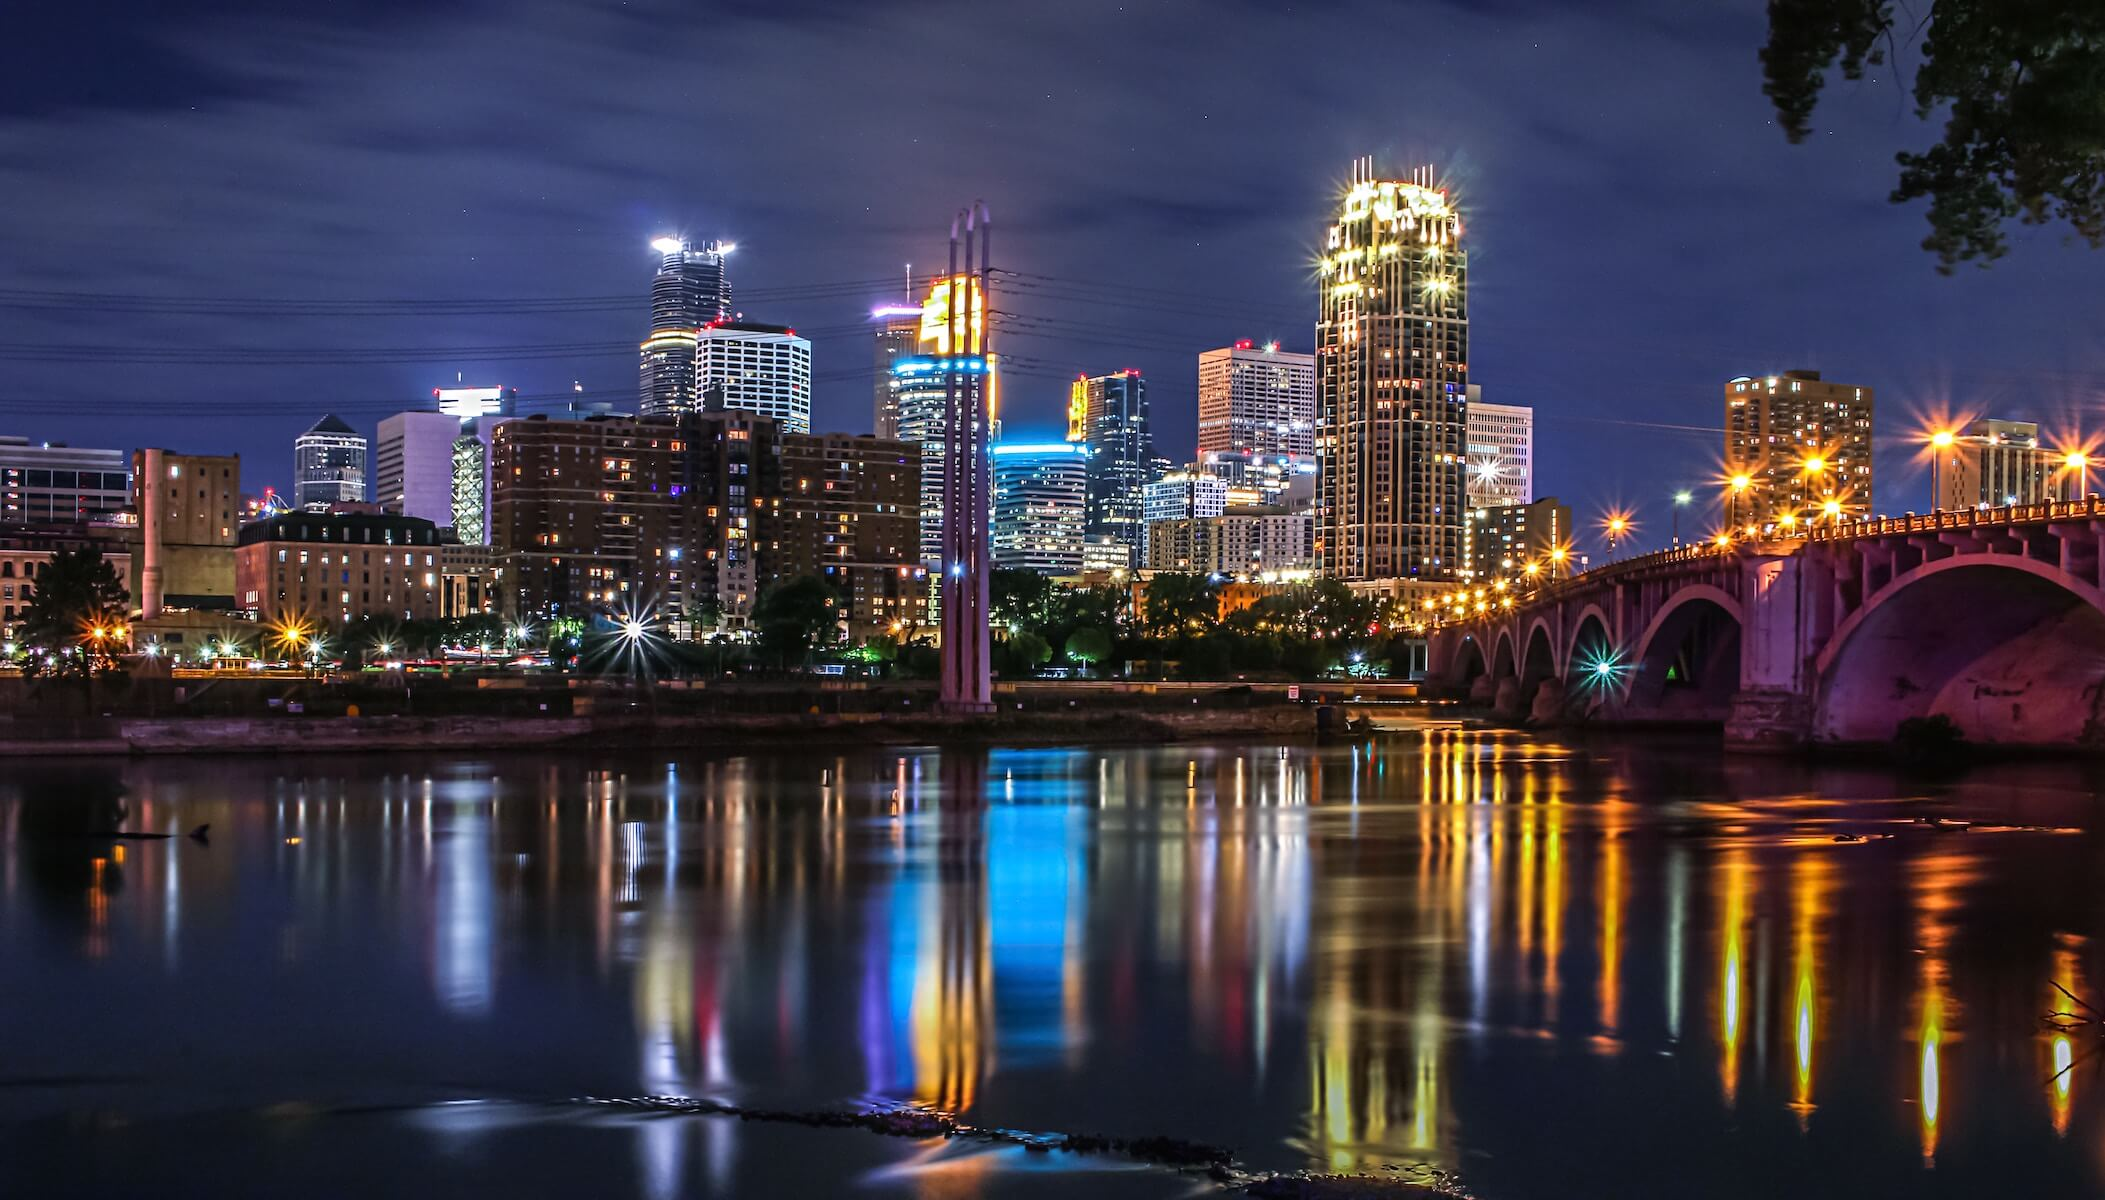 Minneapolis river and bridge view into the city